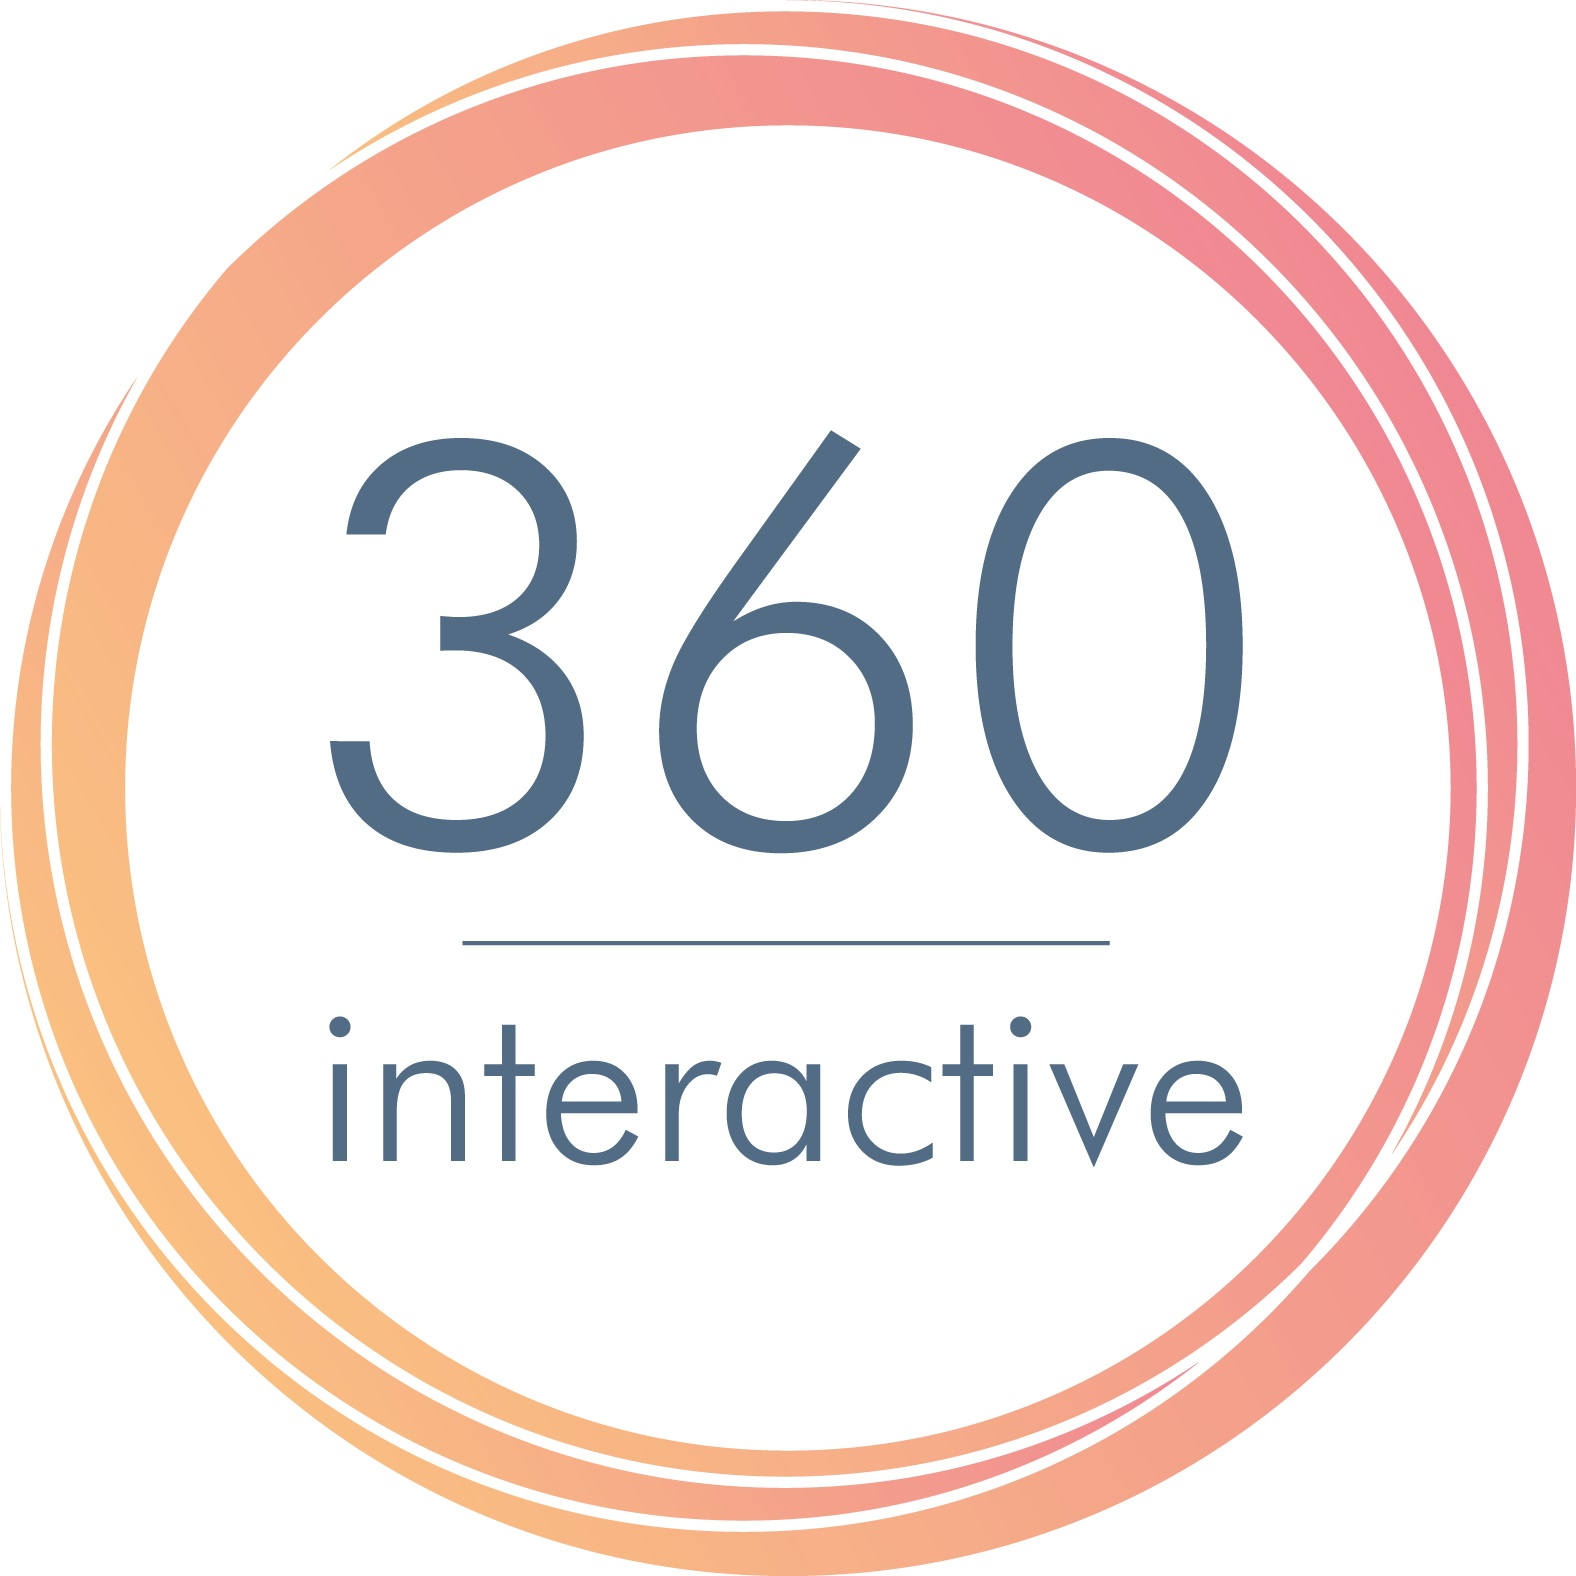 360 interactive media gmbh